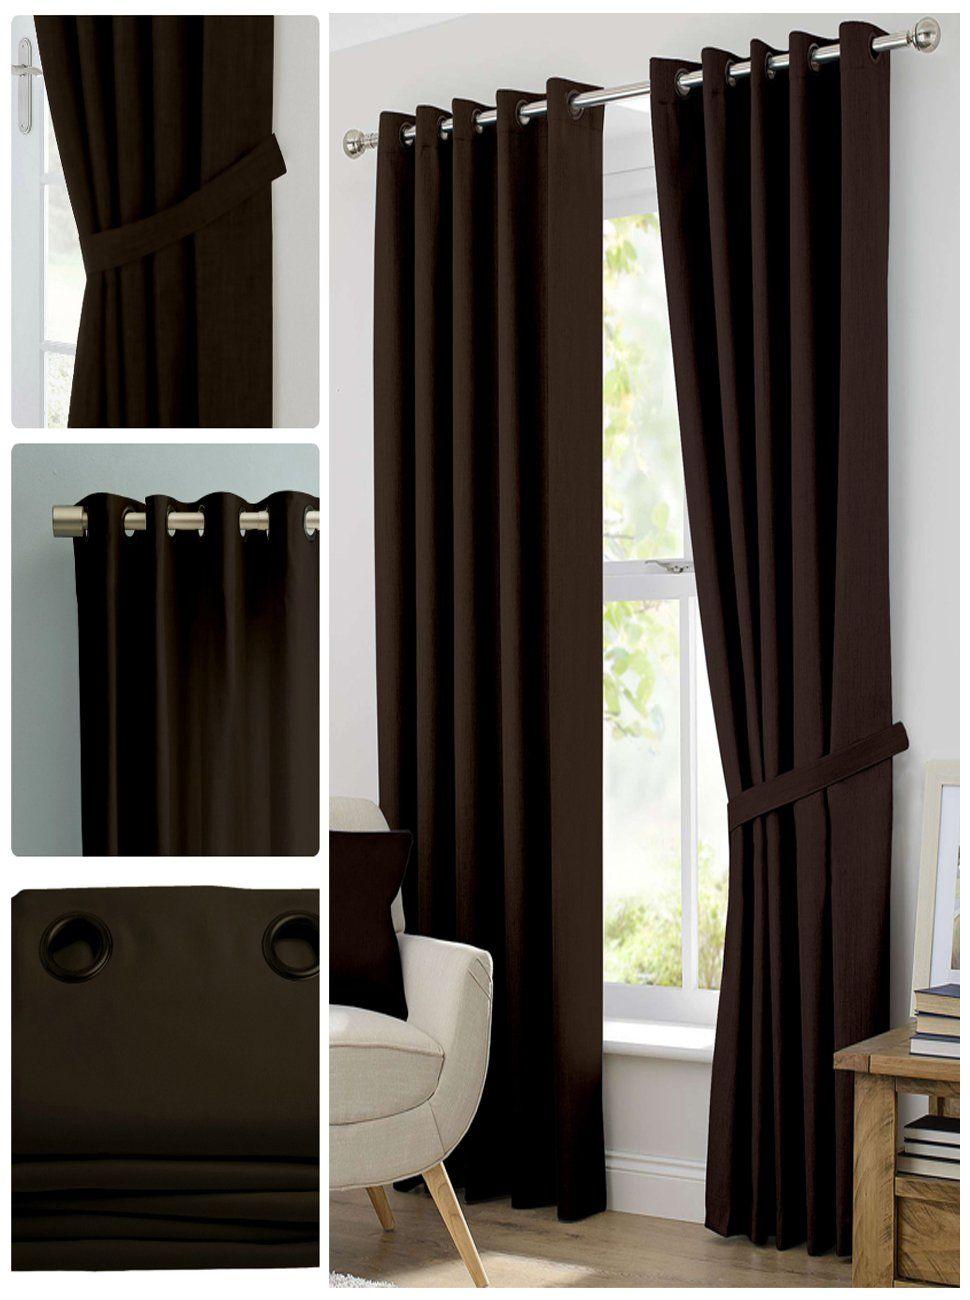 Charming Amazon.com: Blackout Room Darkening Curtains Window Panel Drapes   (Dark  Brown Color